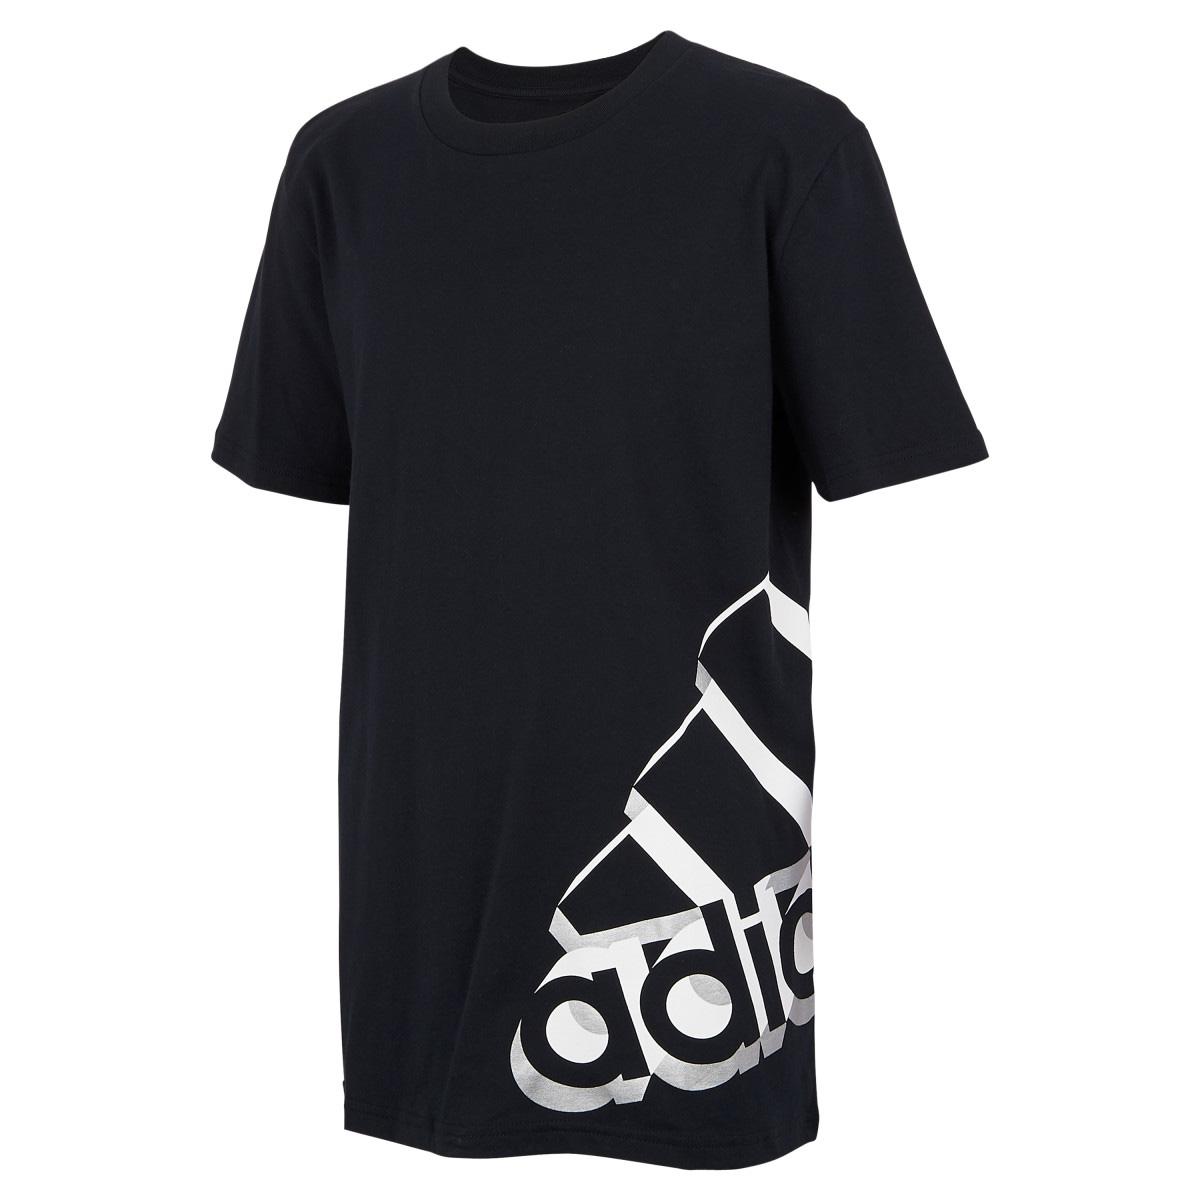 Boys' Short Sleeve Core Repeating Tee, Black, swatch